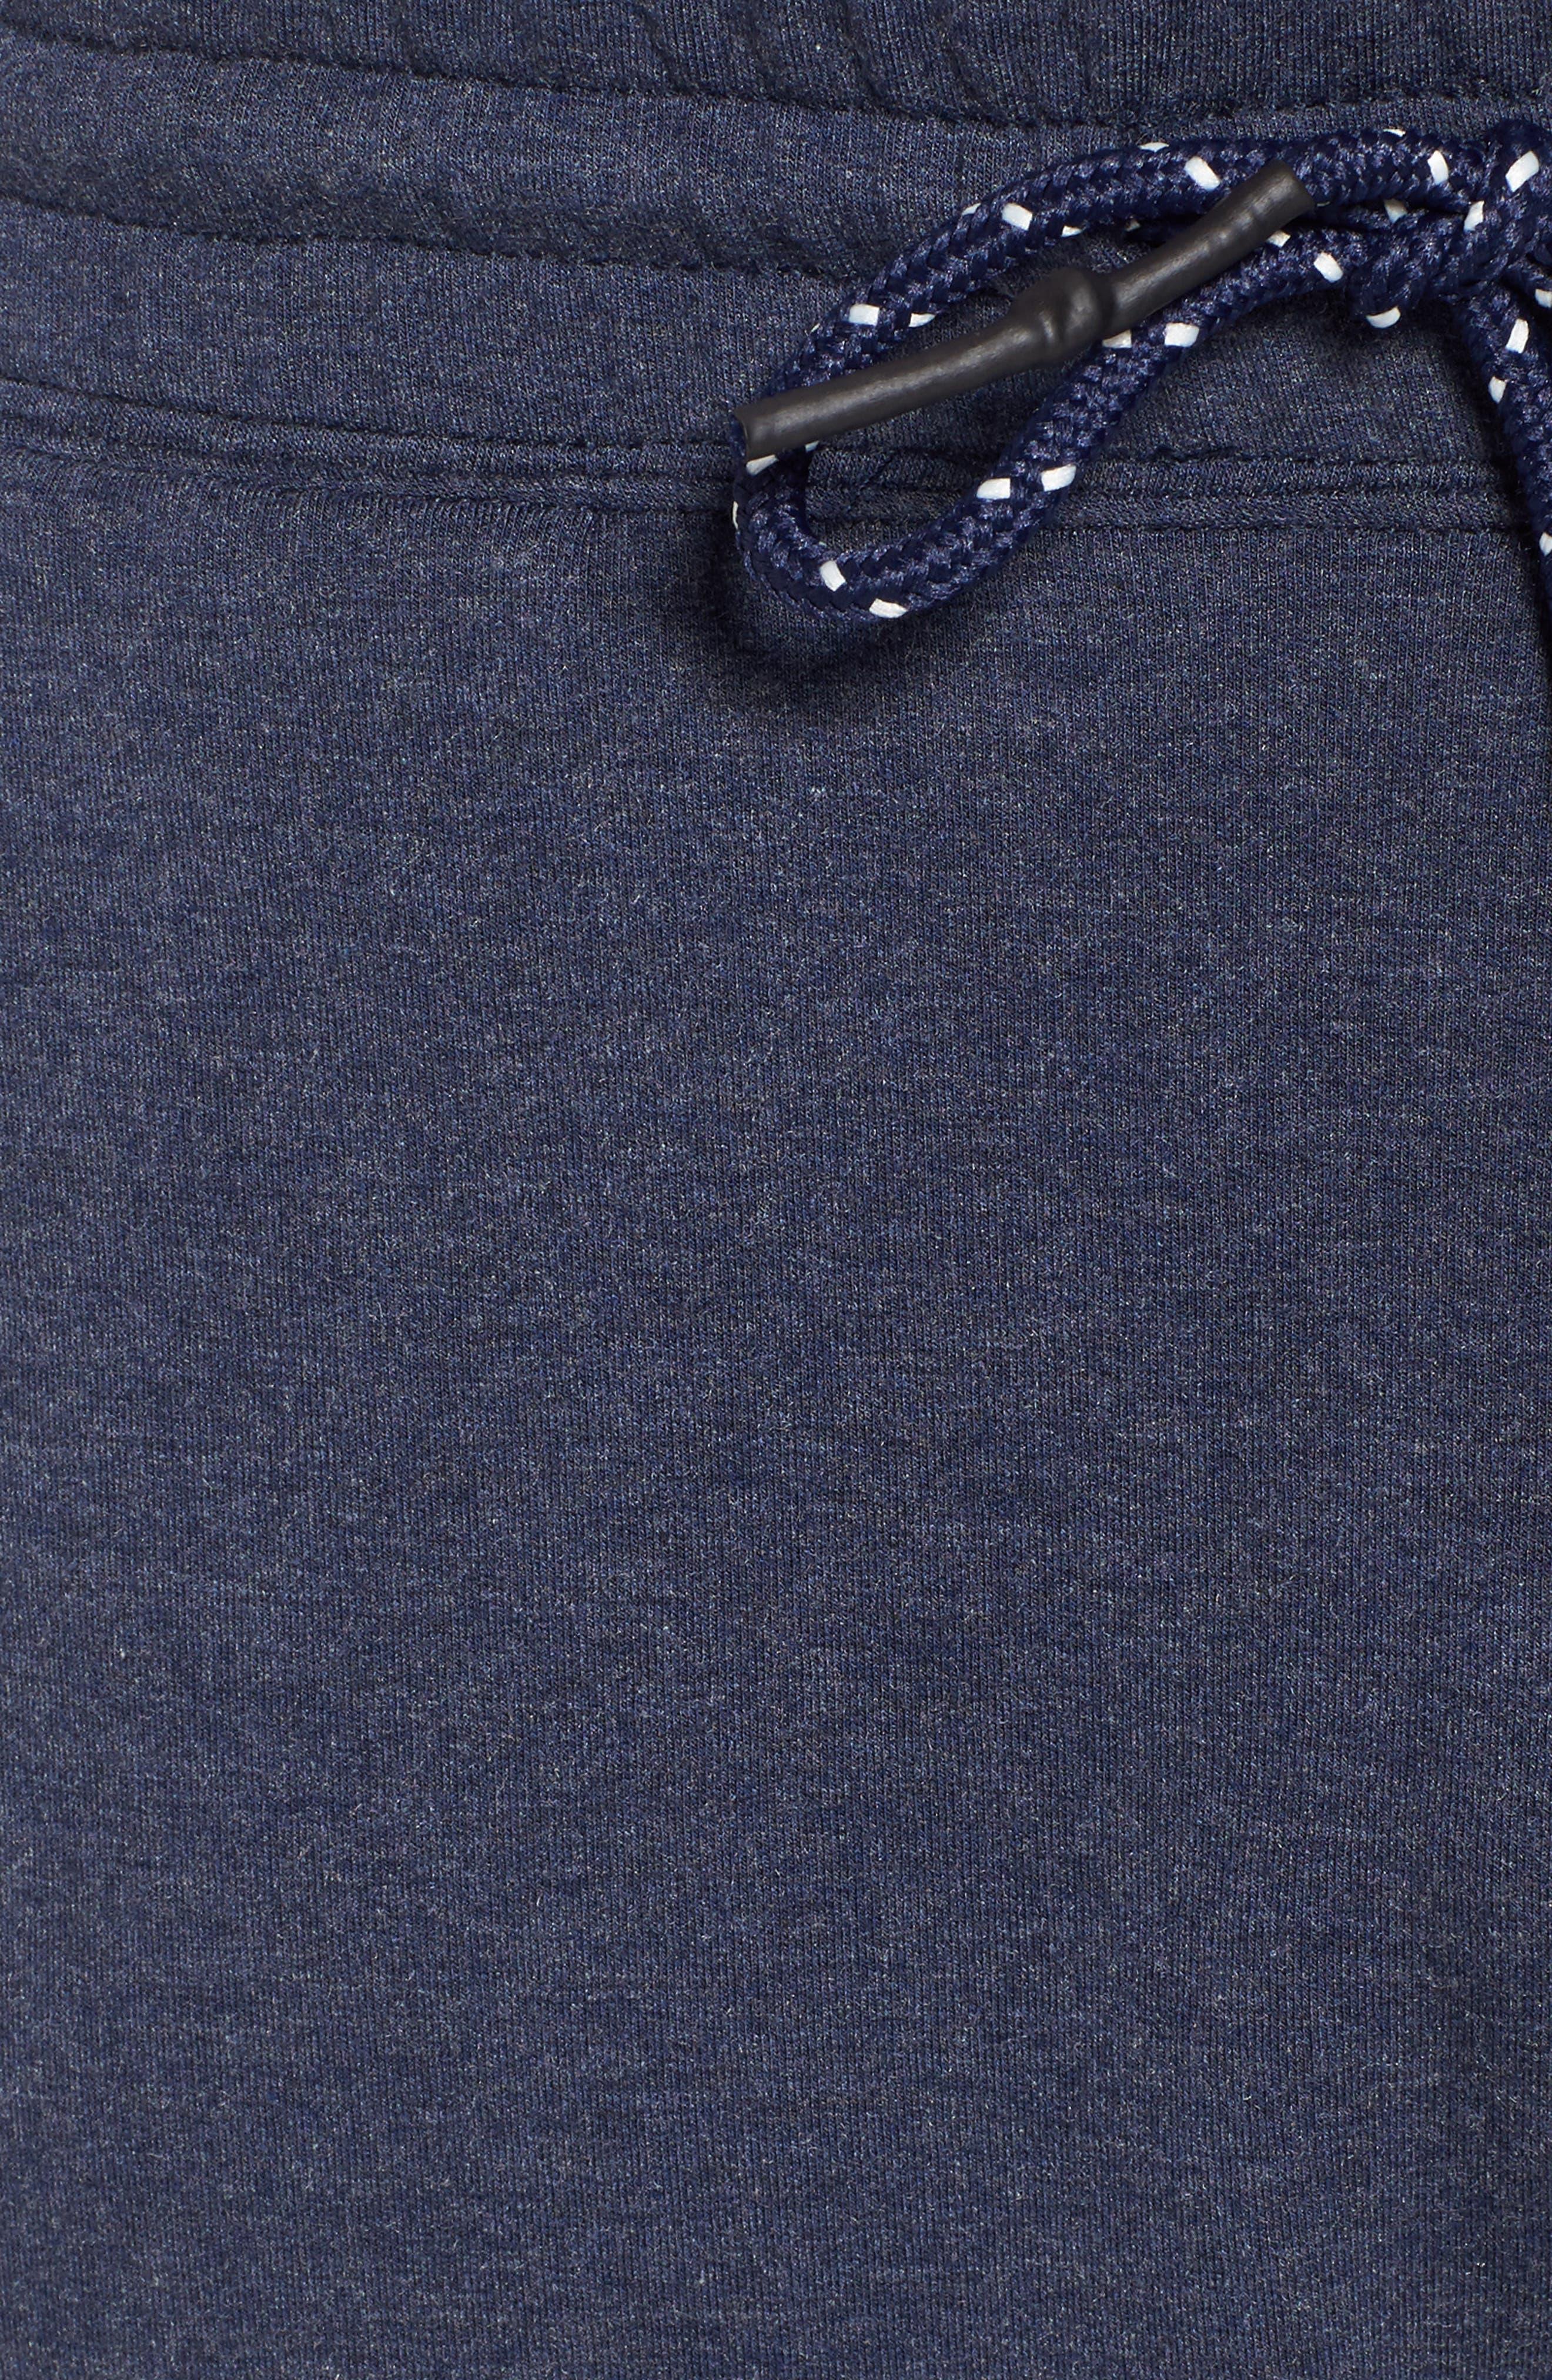 Brushback Fleece Shorts,                             Alternate thumbnail 5, color,                             Navy Heather